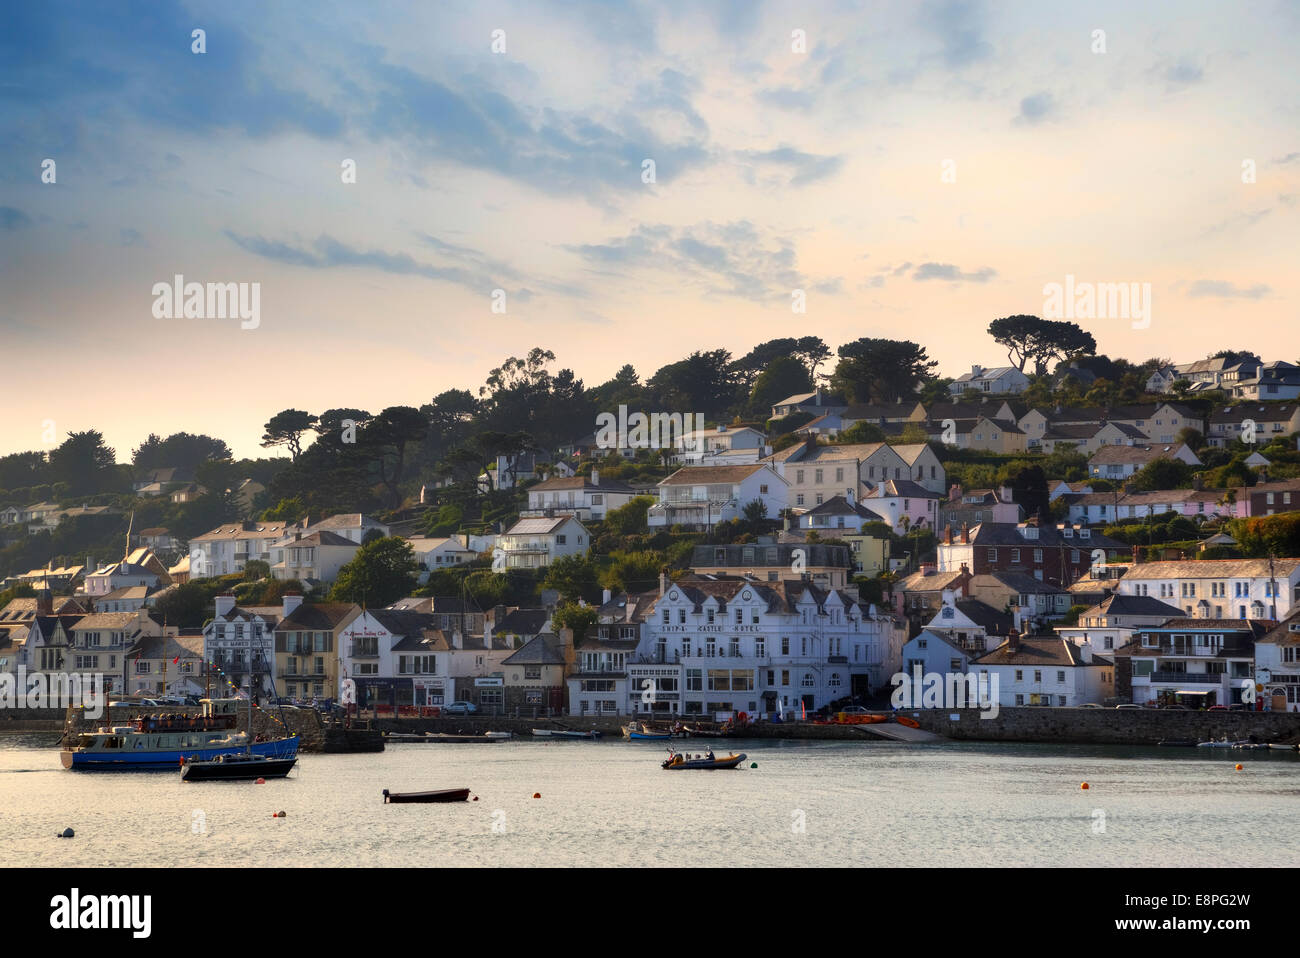 St Mawes, Cornwall, Inglaterra, Reino Unido Imagen De Stock